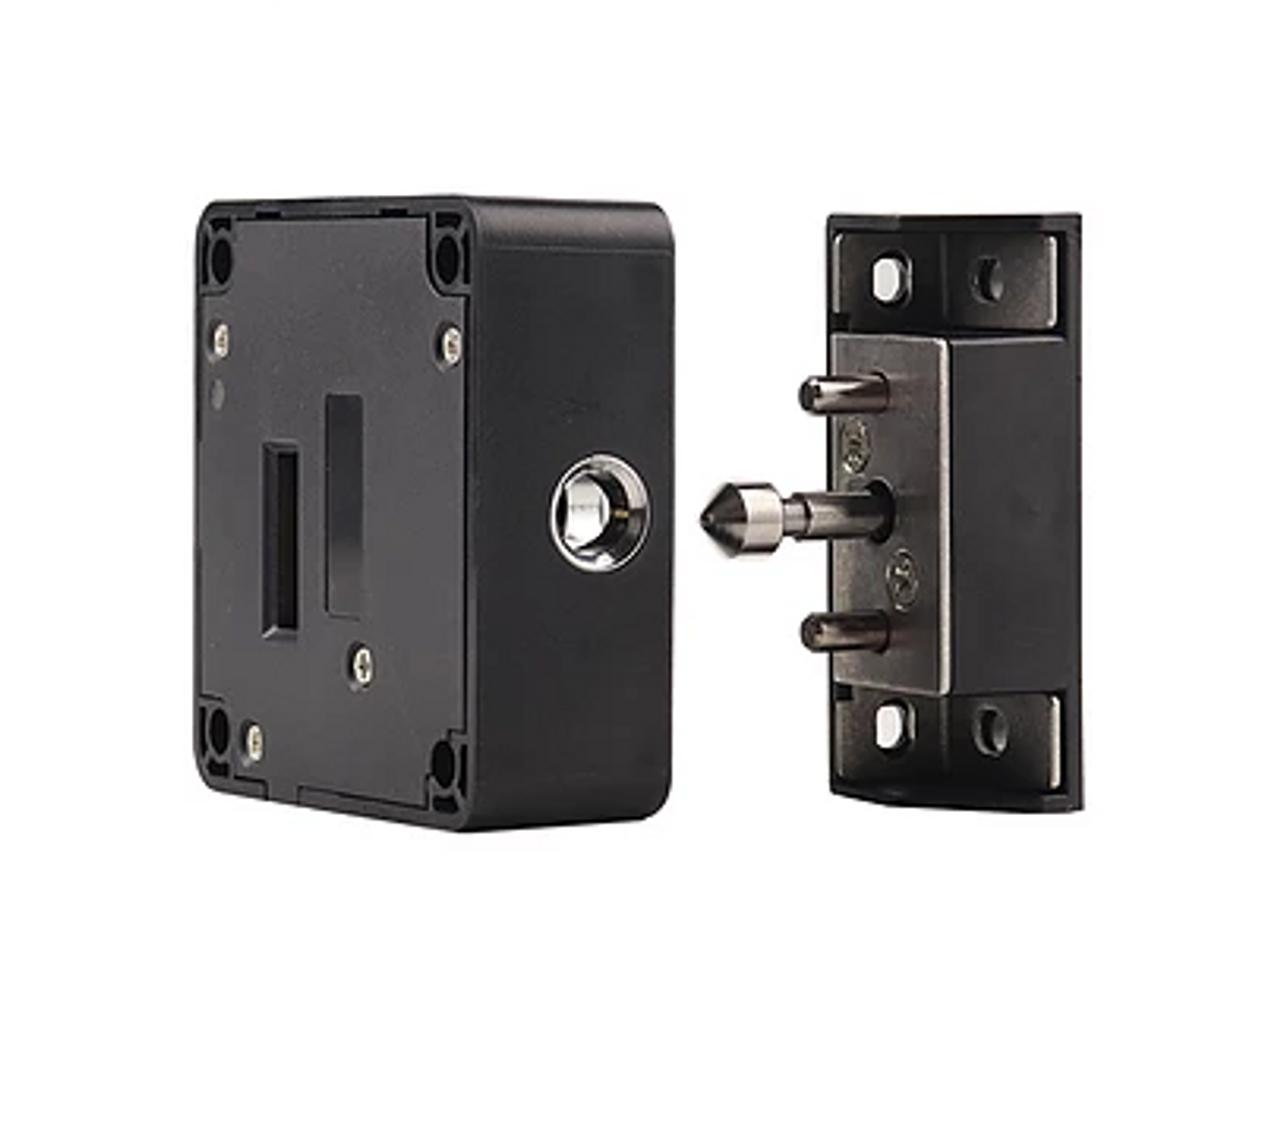 Small RFID Hidden Cabinet Drawer Lock, 3 Keys - Gun Safes, cabinets-13.56 Mhz